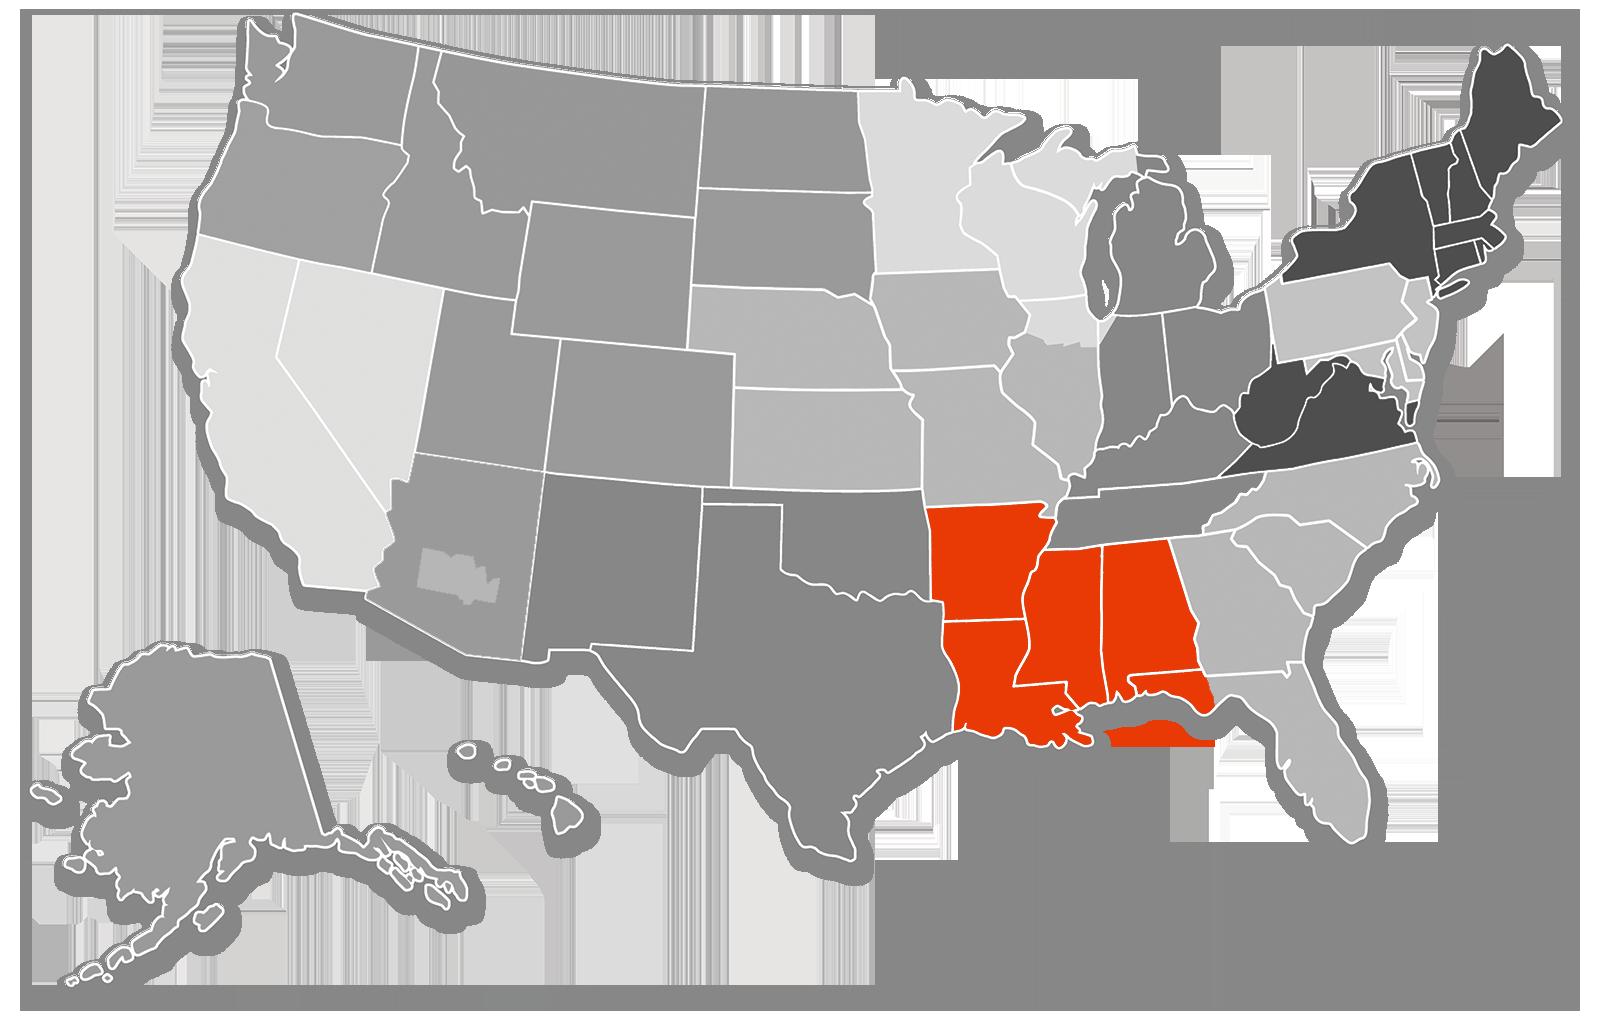 South Territory